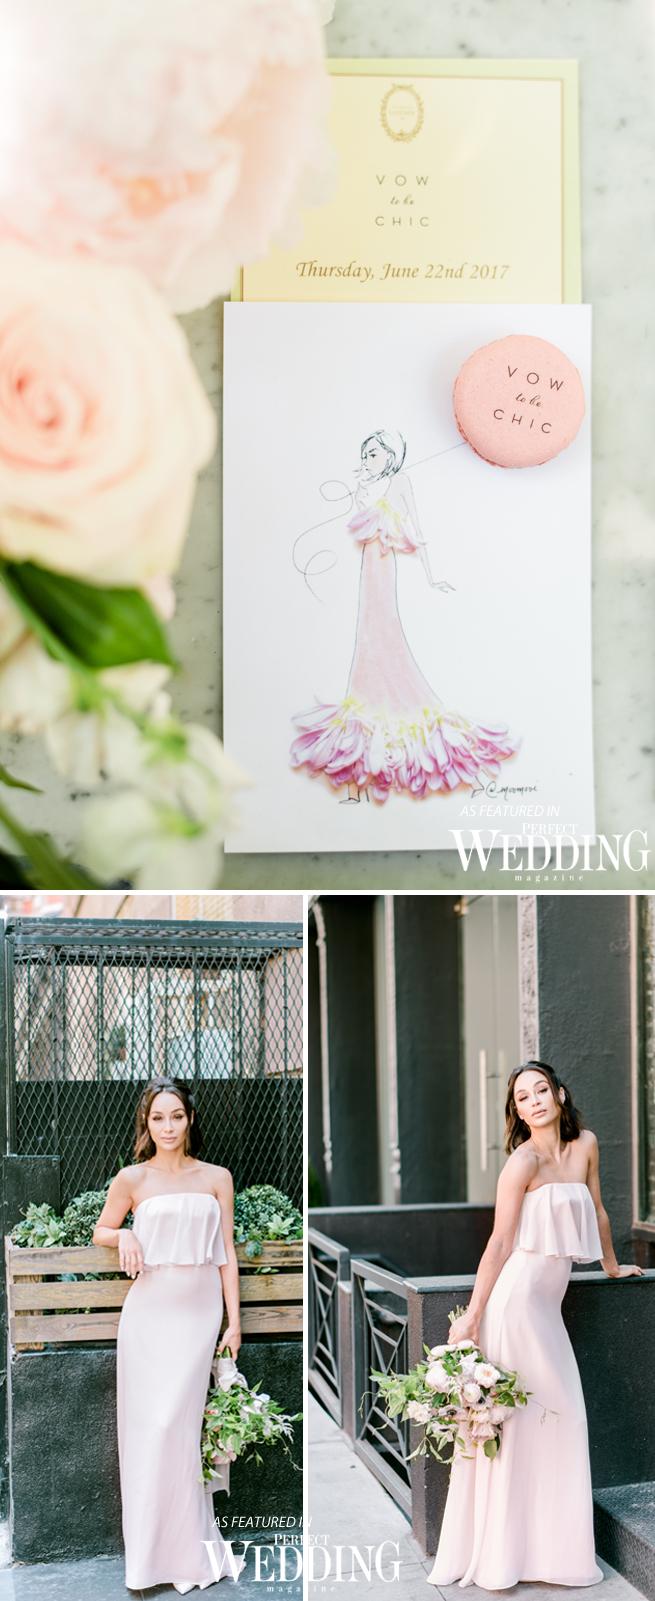 The Glam App, Ladurée SoHo, Perfect Wedding Magazine, Monique Lhuillier, MoniqueLhuillierXVowtobeChic, Vow to be Chic, Cara Santana, Bridesmaieds, Cara dress,